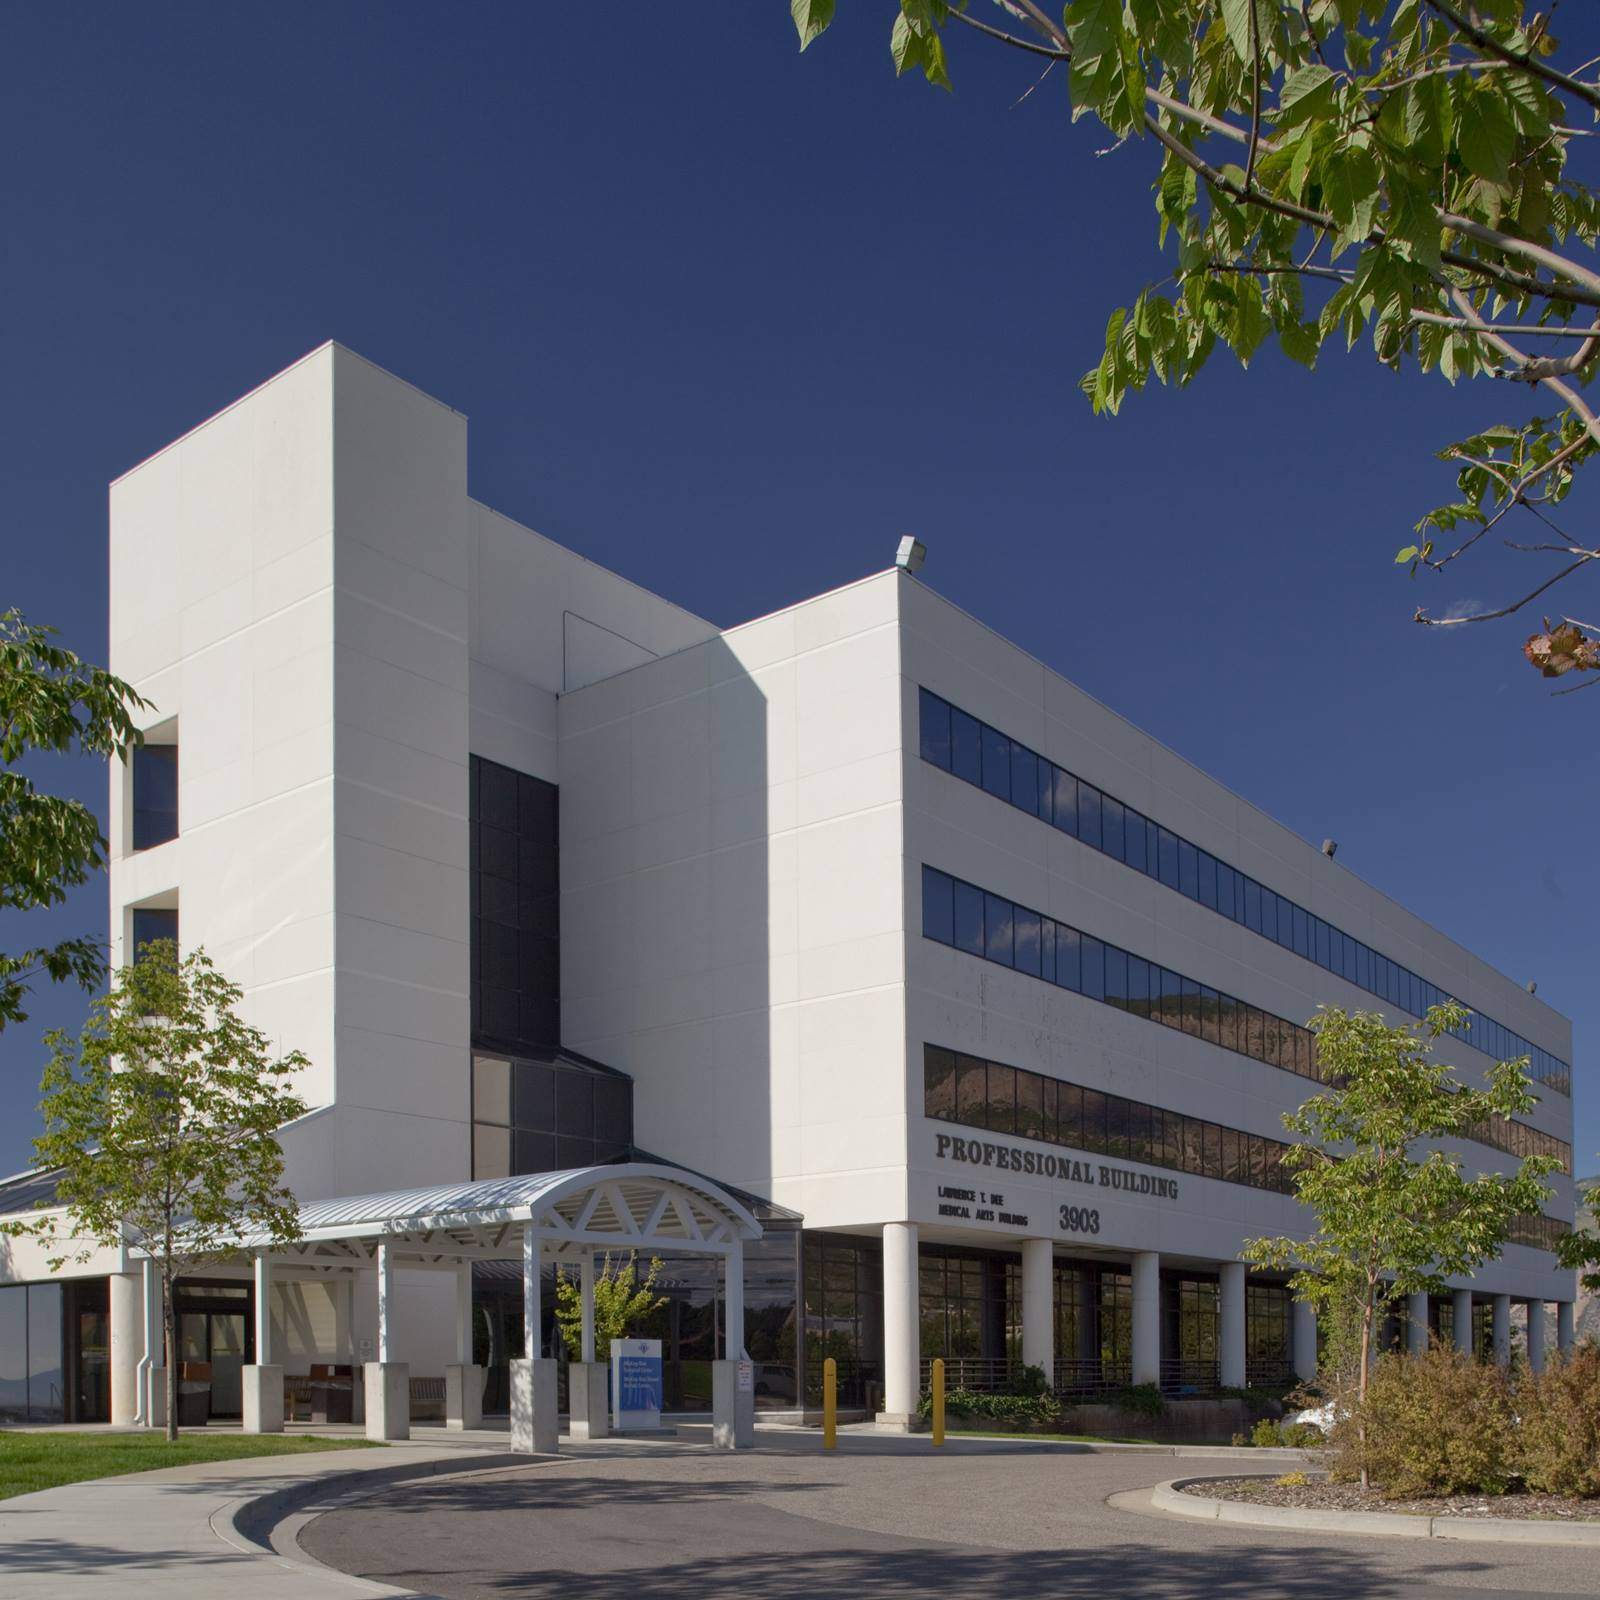 Mckay Dee Behavioral Health Outpatient Intermountain Healthcare